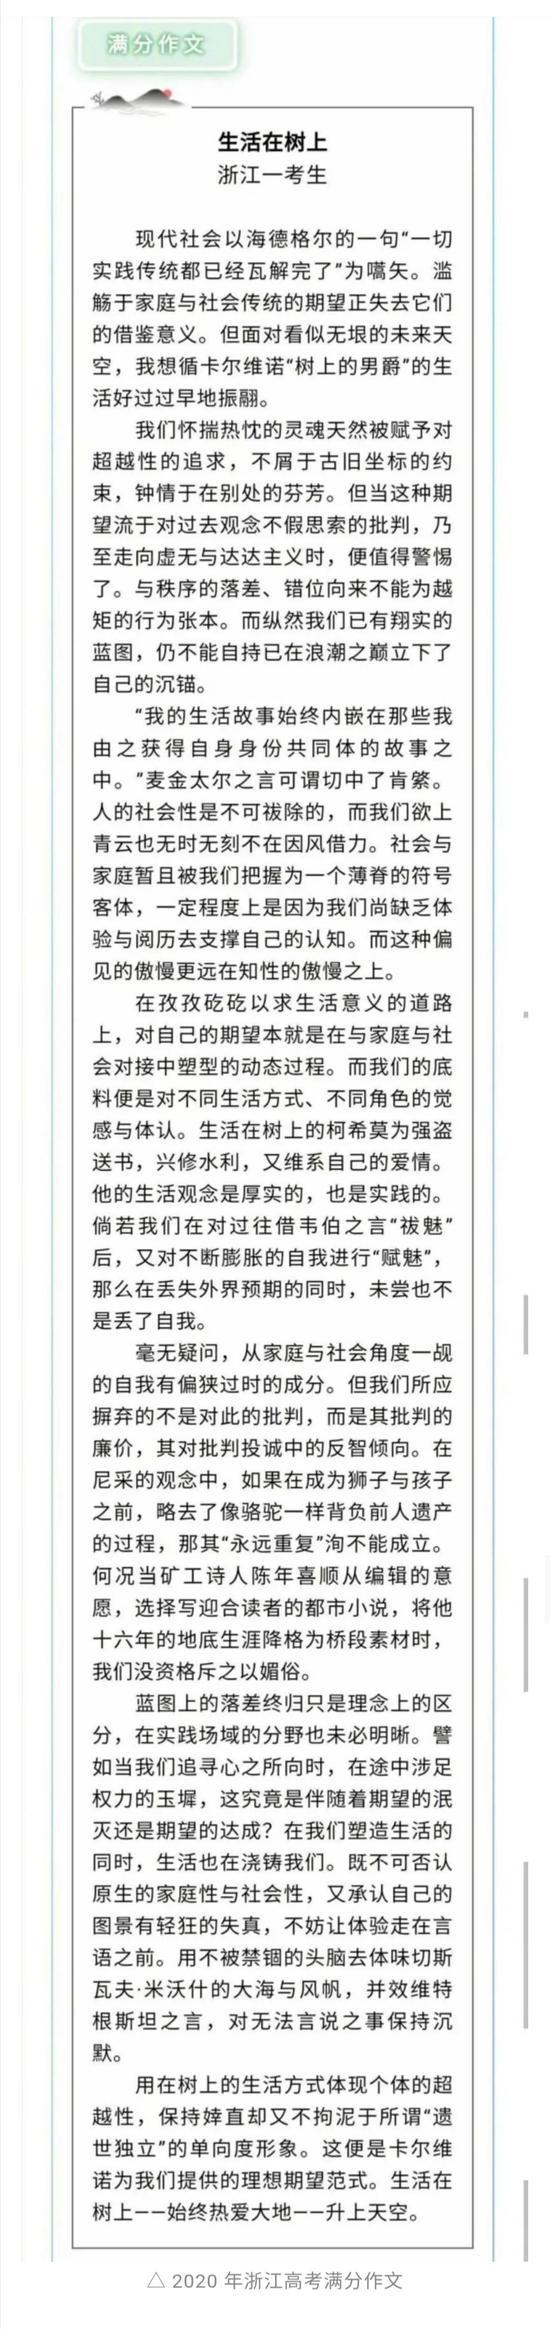 http://www.edaojz.cn/youxijingji/779299.html